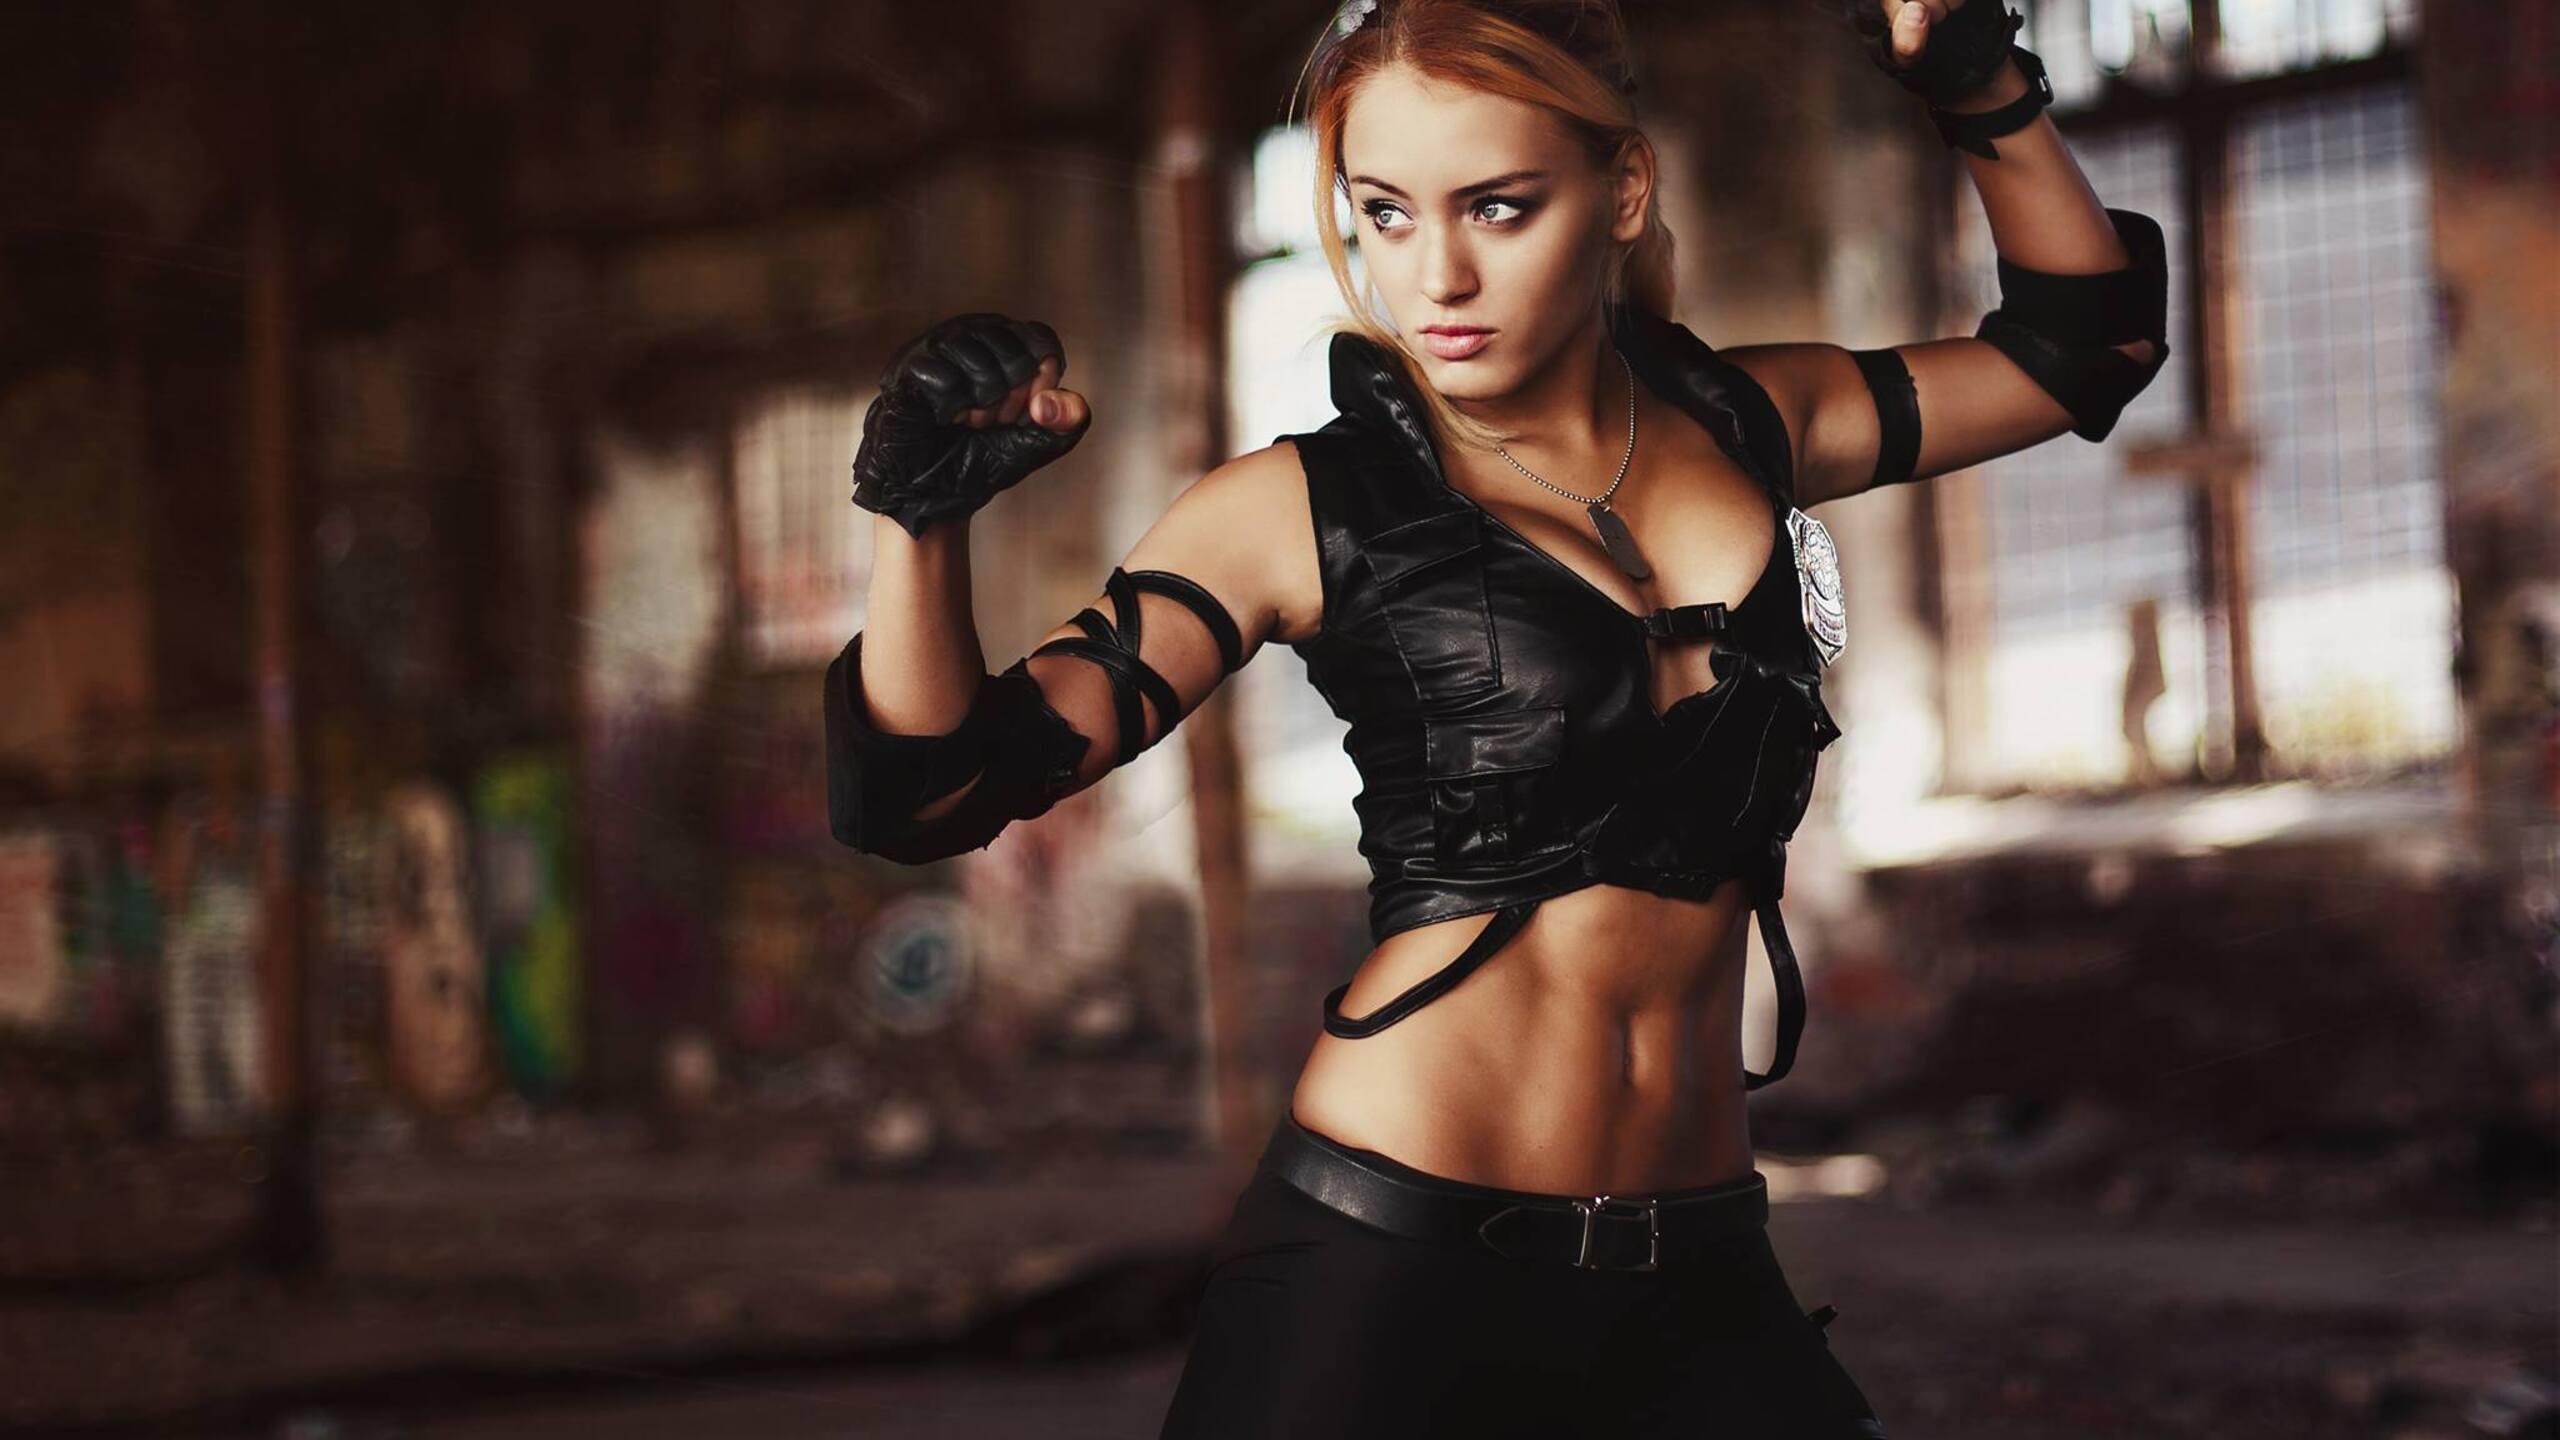 2560x1440 Sonya Blade Mortal Kombat Cosplay 1440P ...